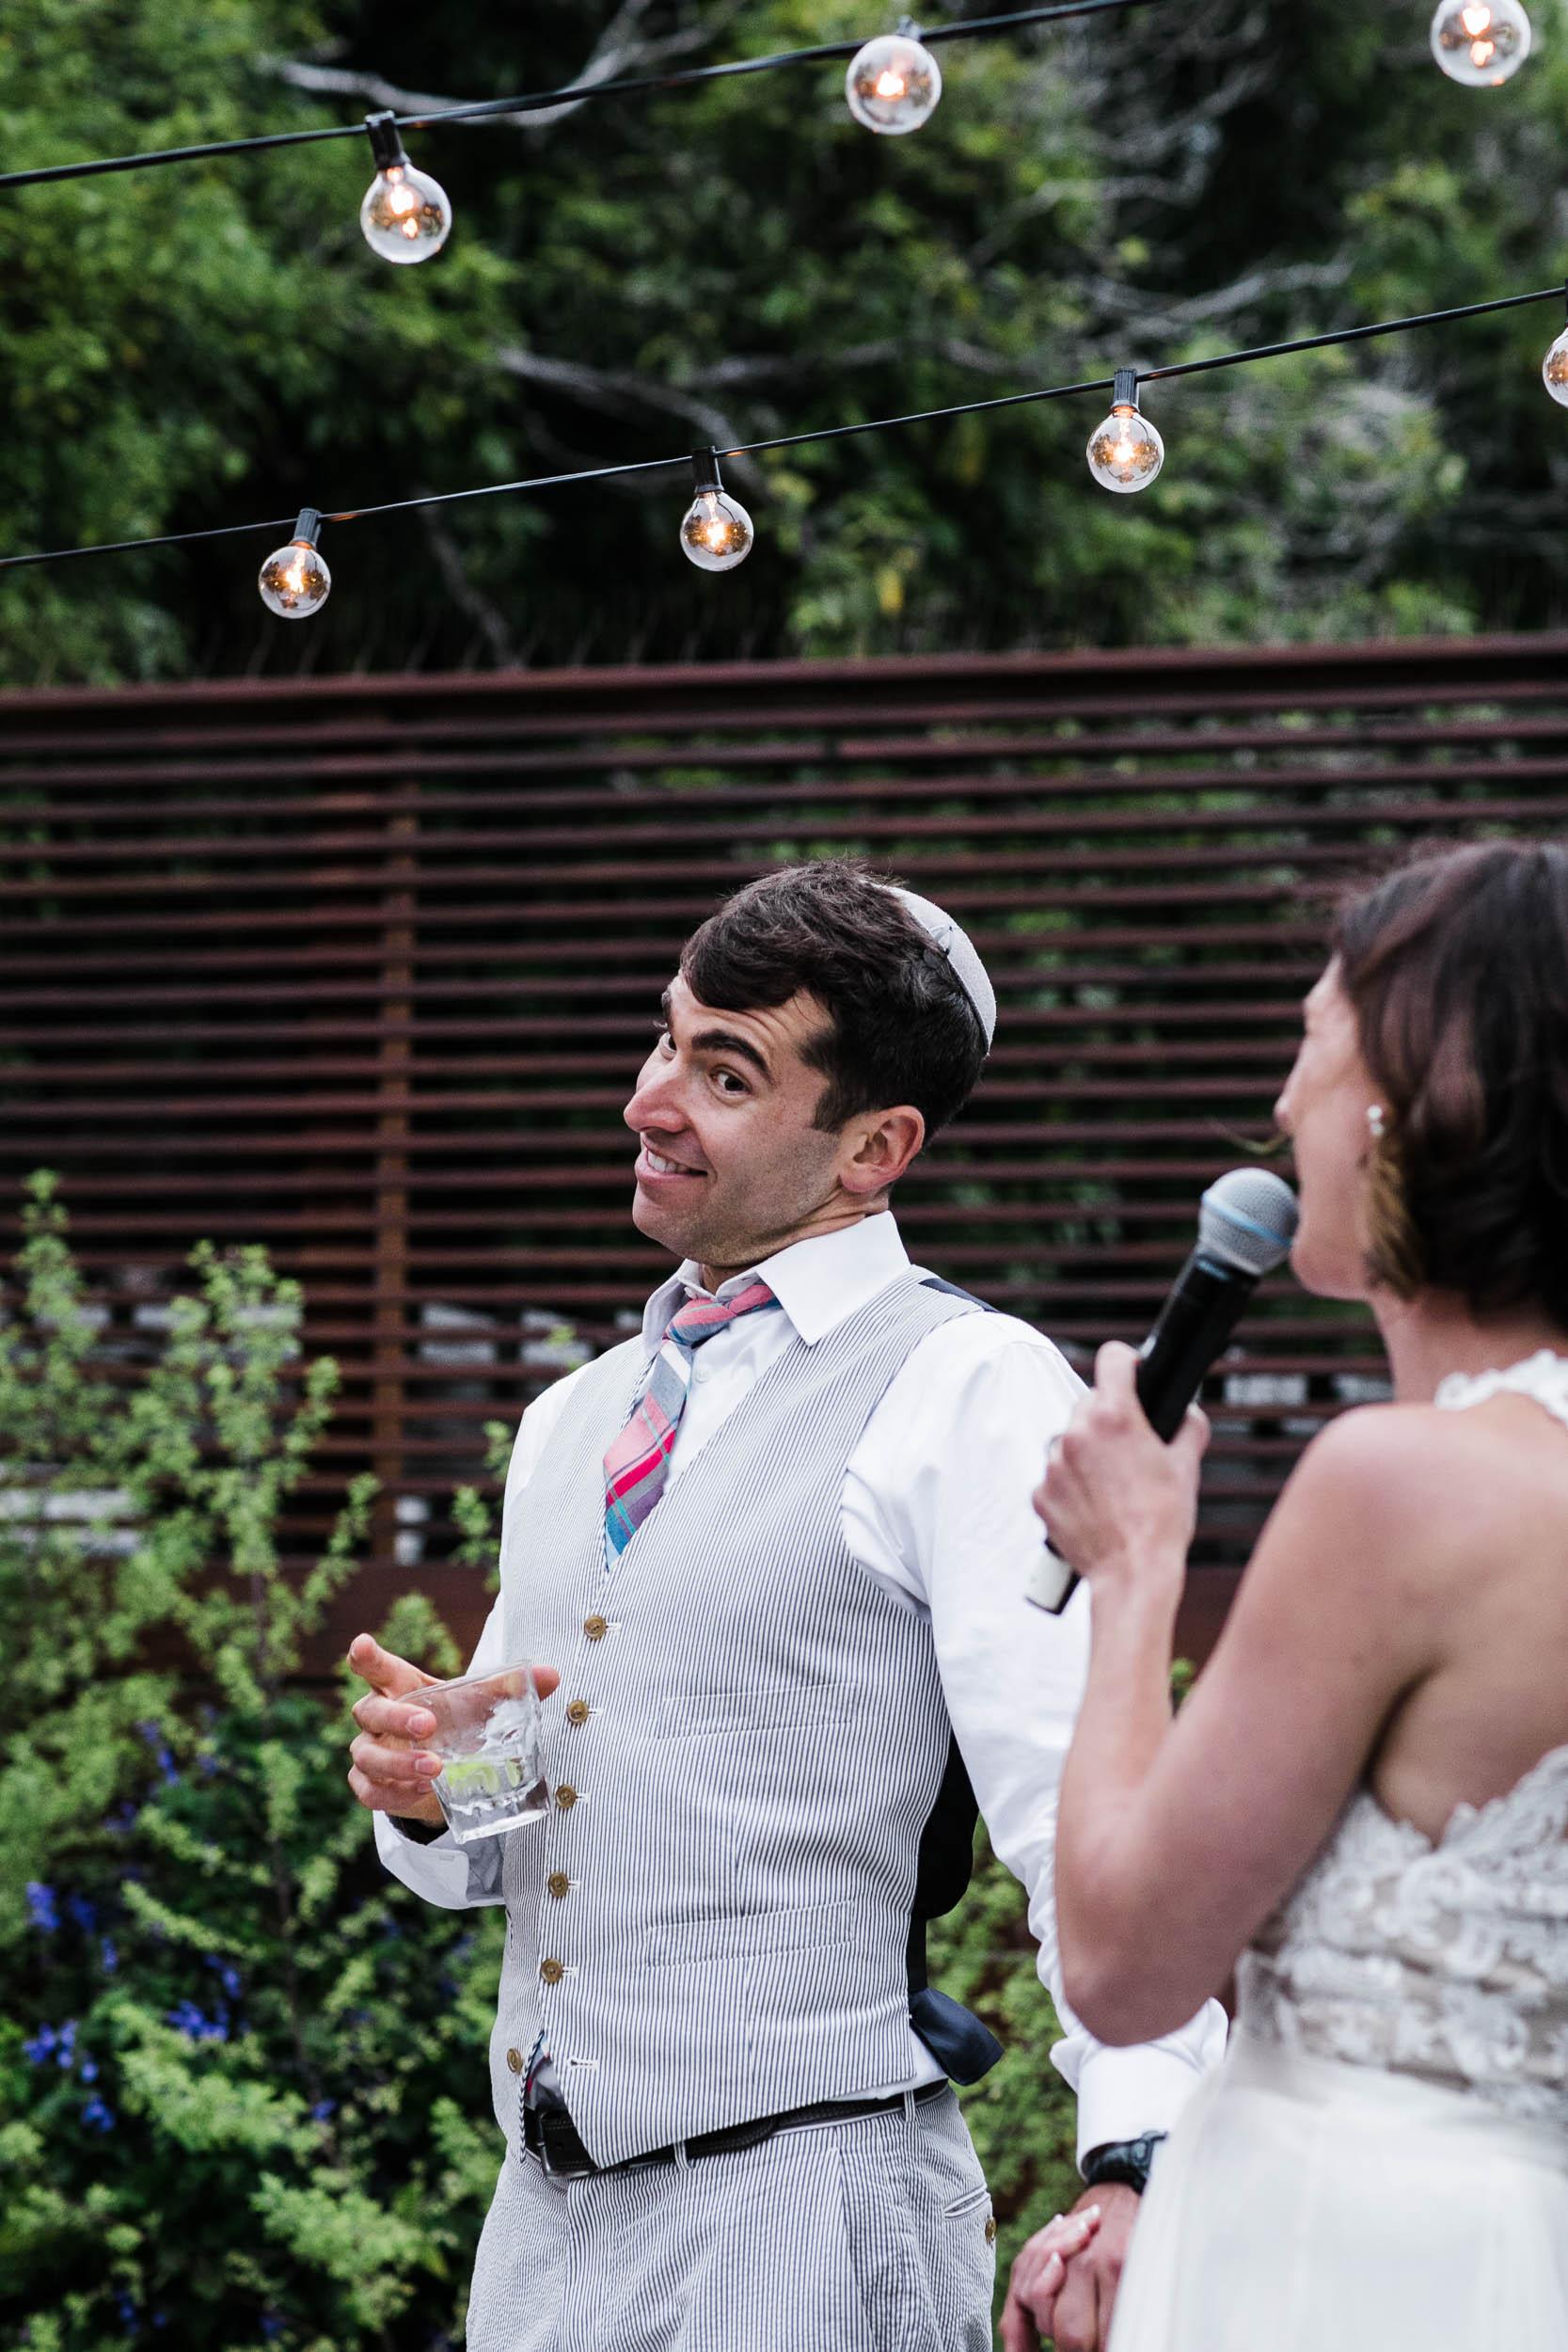 081818_Alina Jason San Francisco Wedding_Buena Lane Photography_2897 copy.jpg